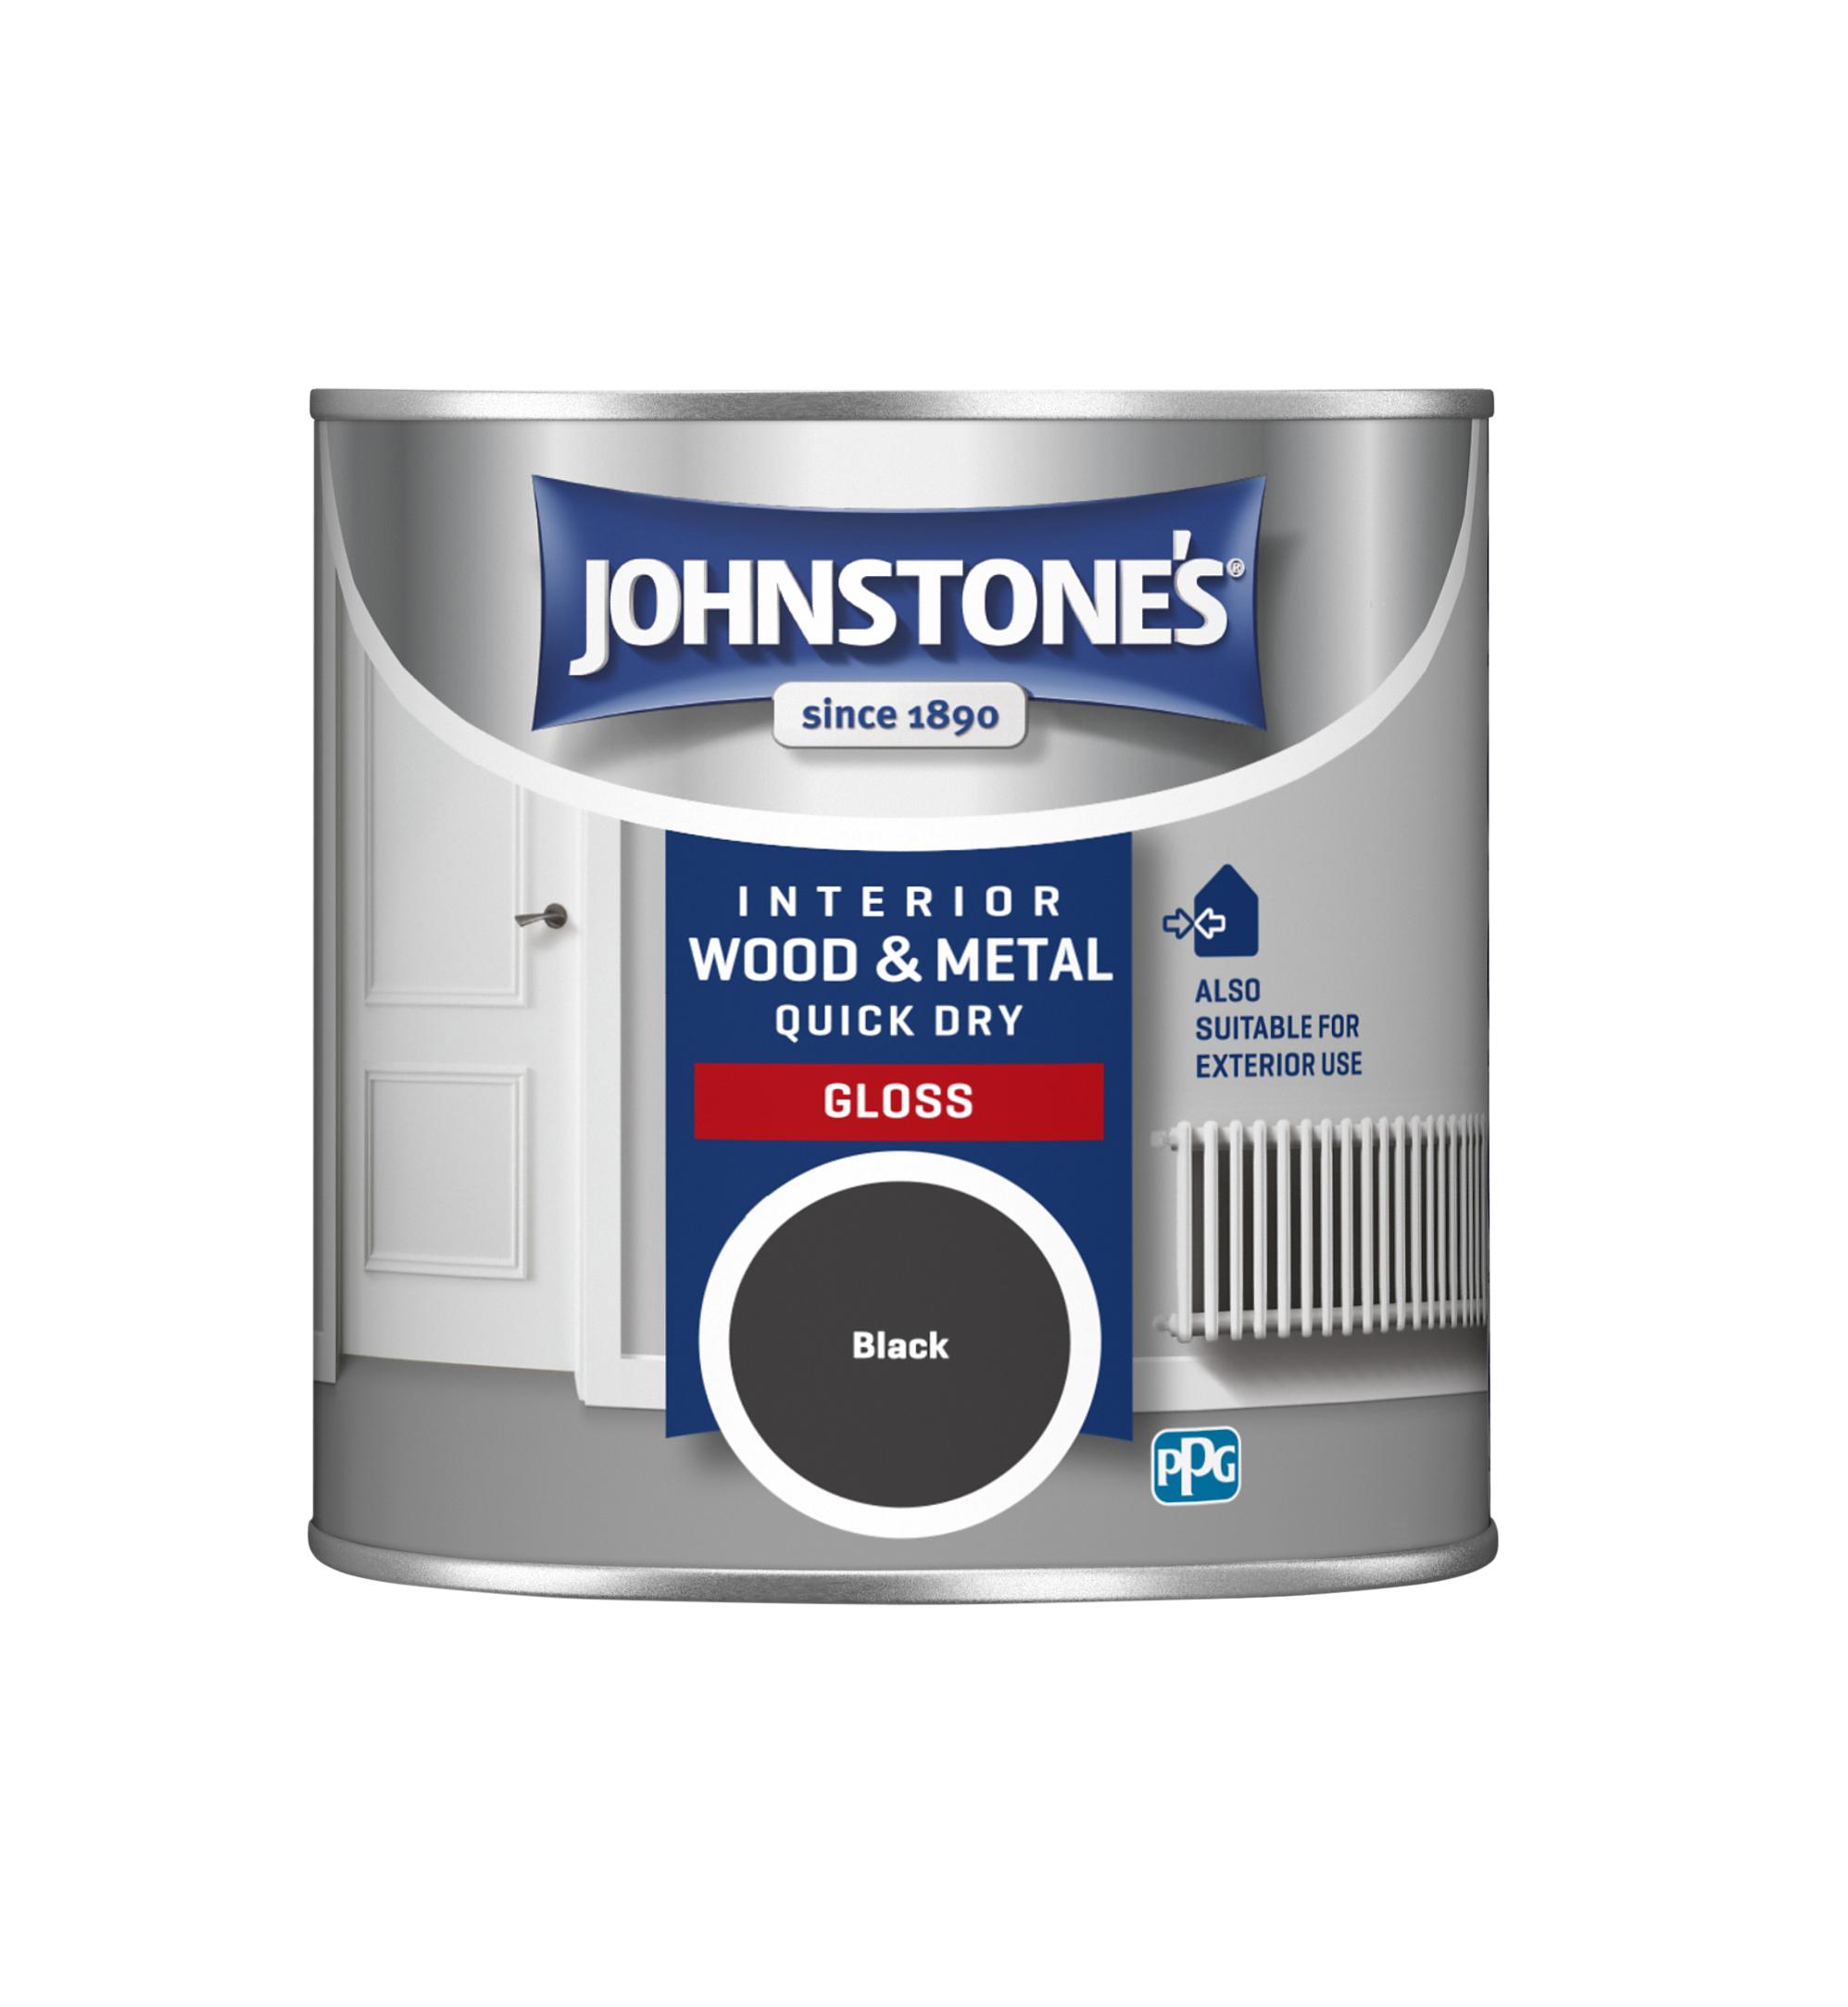 Johnstones 250ml Quick Dry Gloss Paint - Black